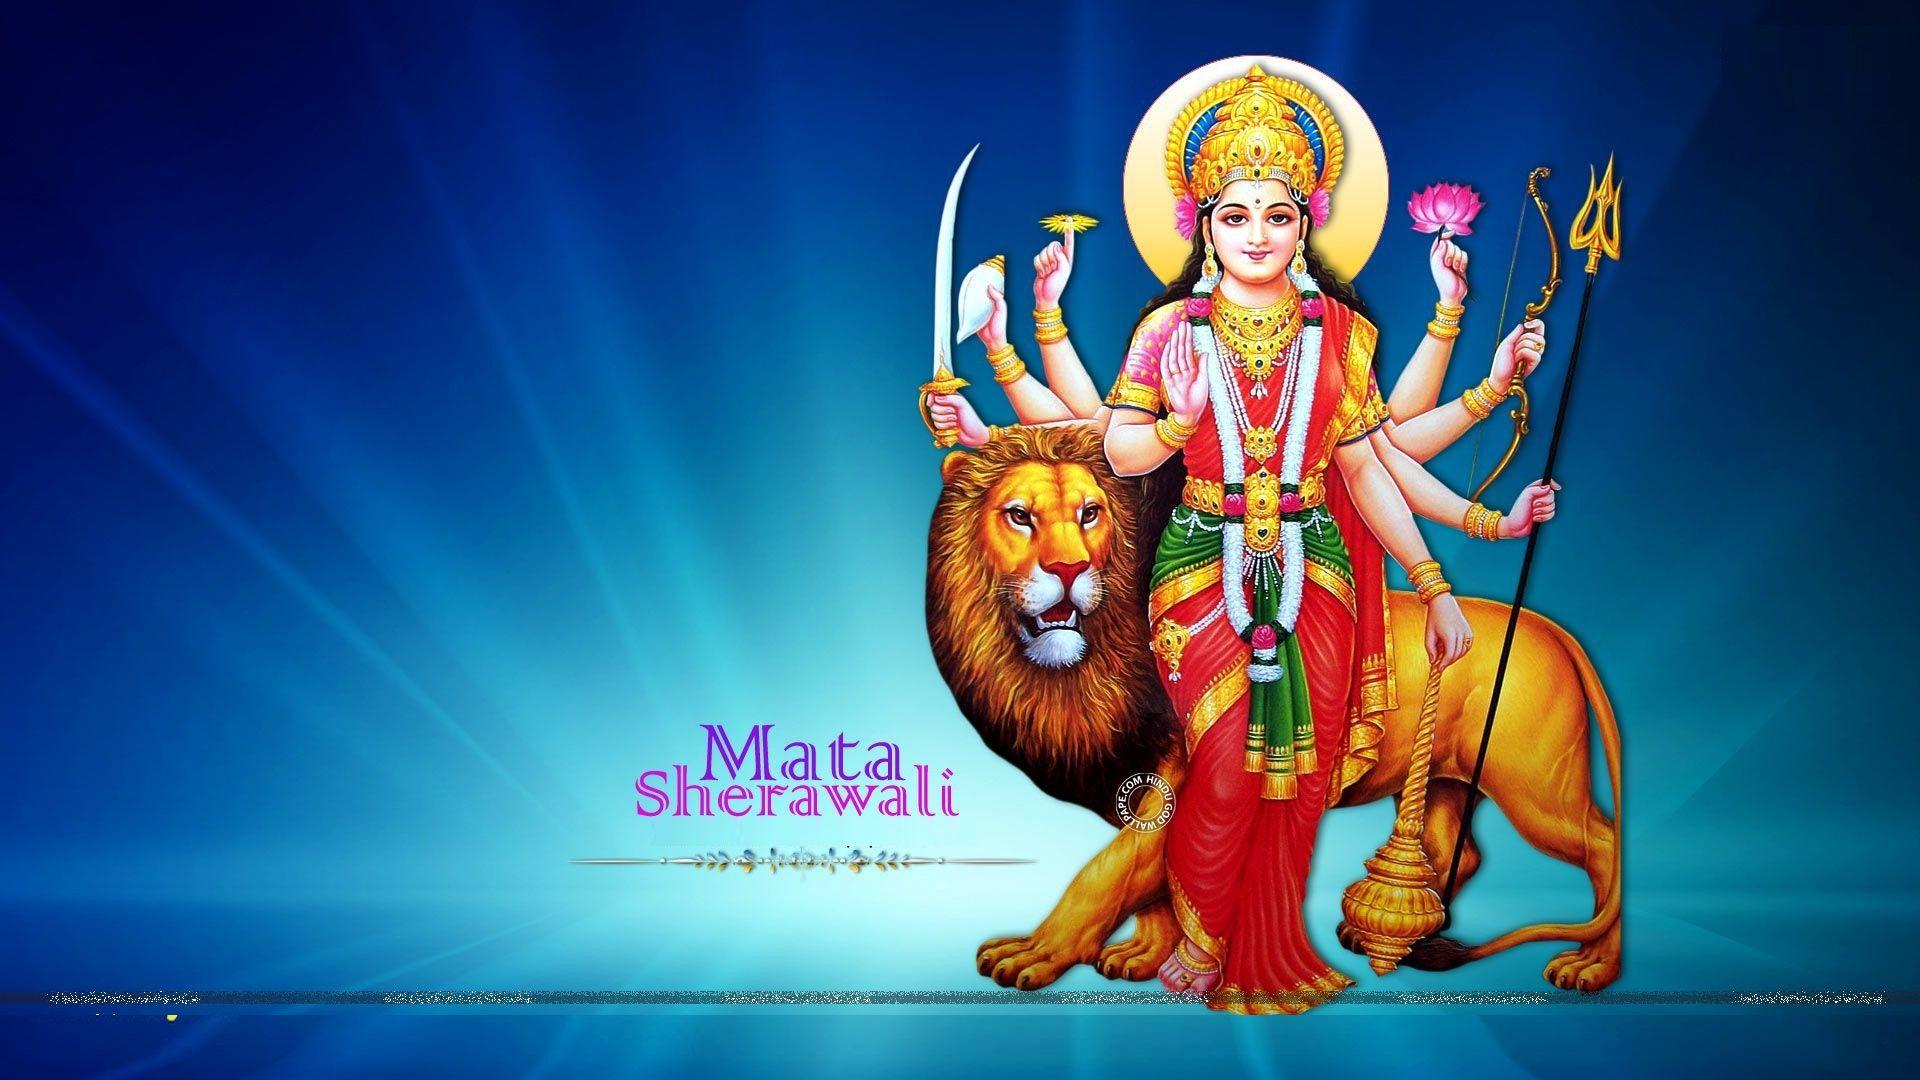 Jai Mata Di Goddess Durga Desktop Wallpaper Festivals